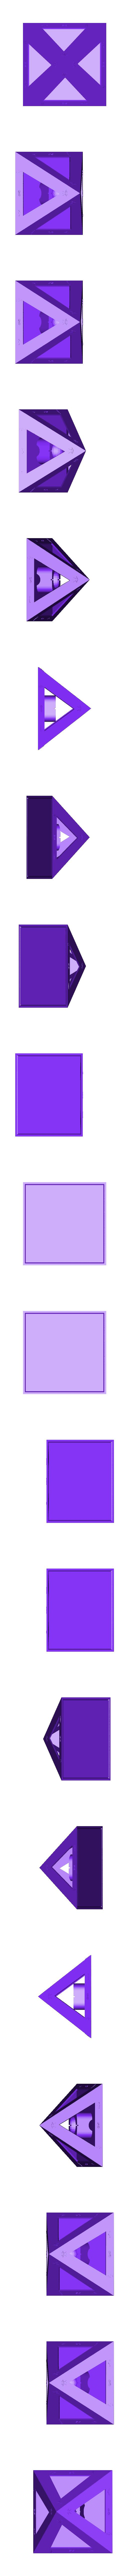 PiramidWS_txt.stl Descargar archivo STL PIRAMIDE ENERGÉTICA #3 • Objeto para imprimir en 3D, miguelonmex